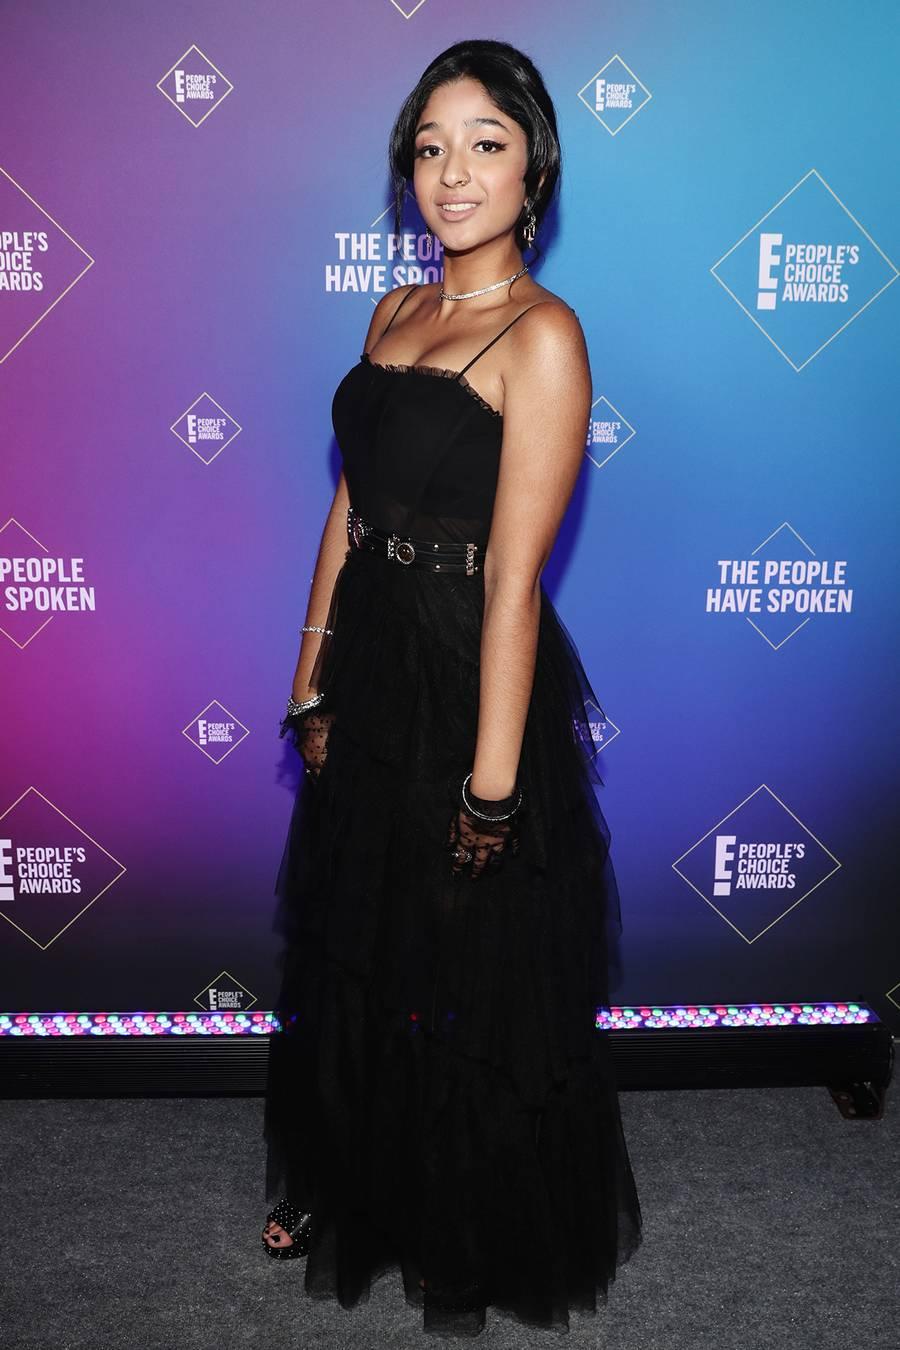 maitreyi-ramakrishnan-in-black-gown-e-peoples-choice-awards-2020